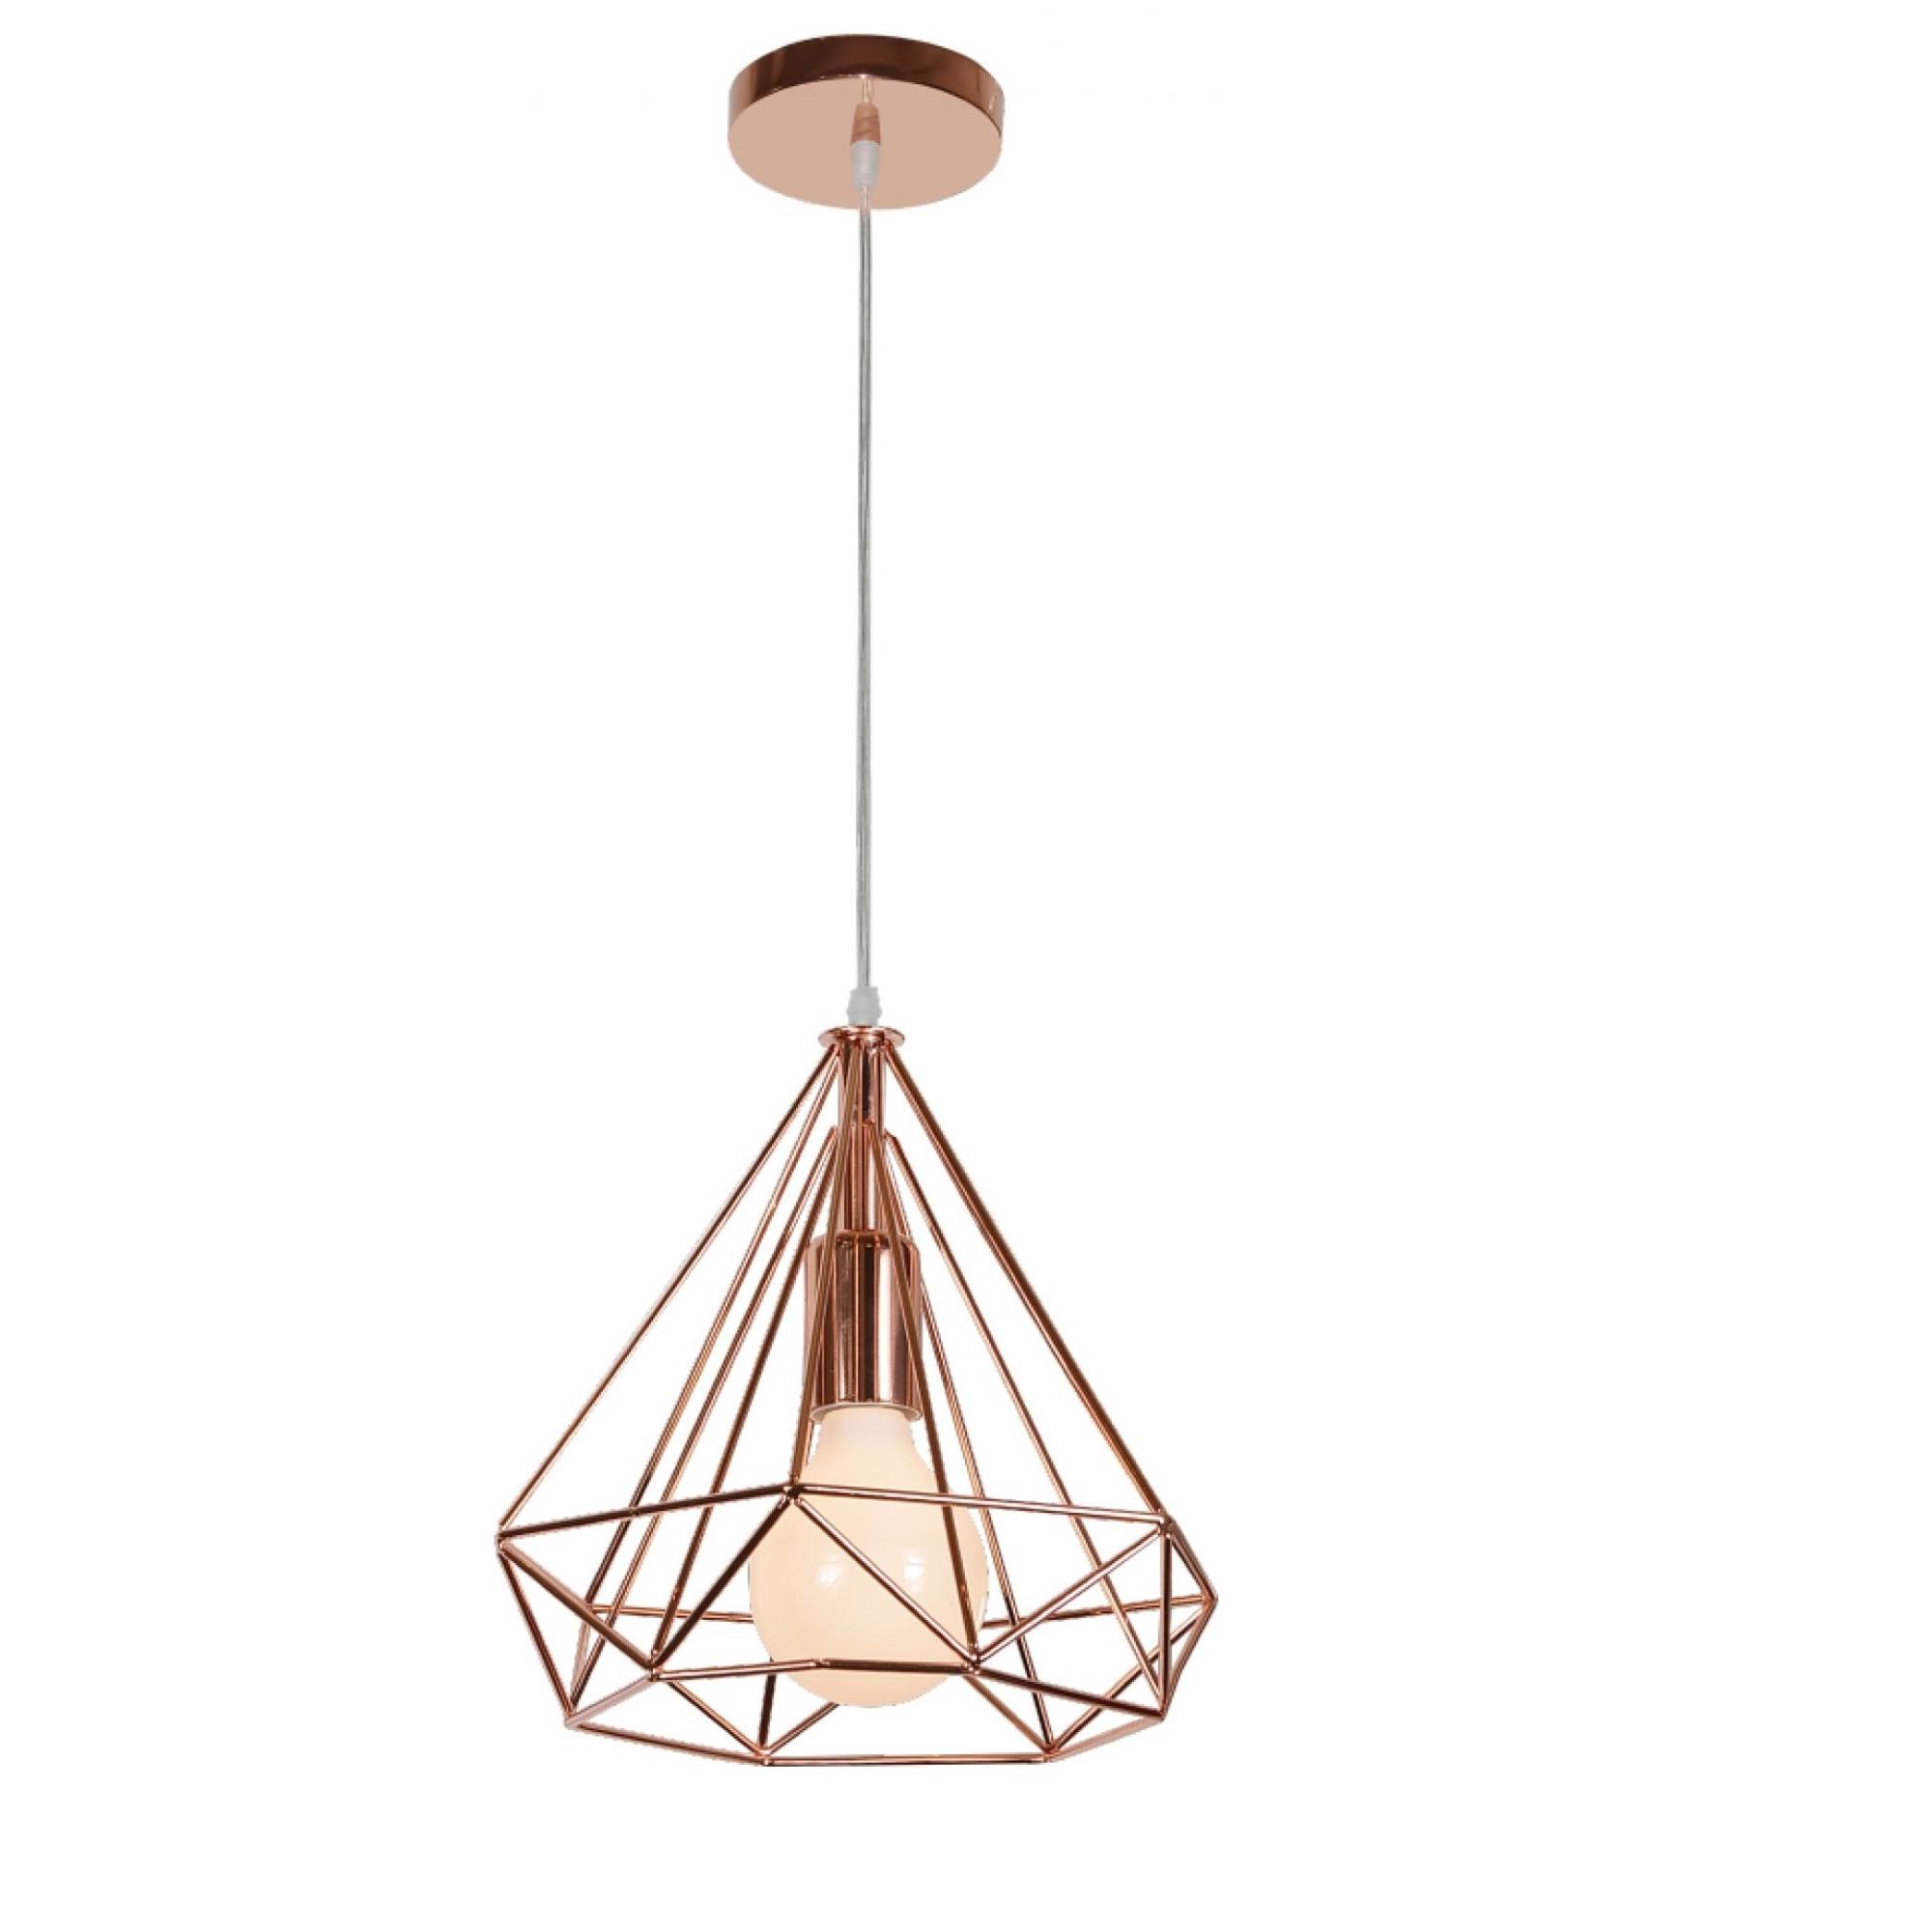 Pendente Tetra 30x25cm 1 Lampada Cobre - Llum